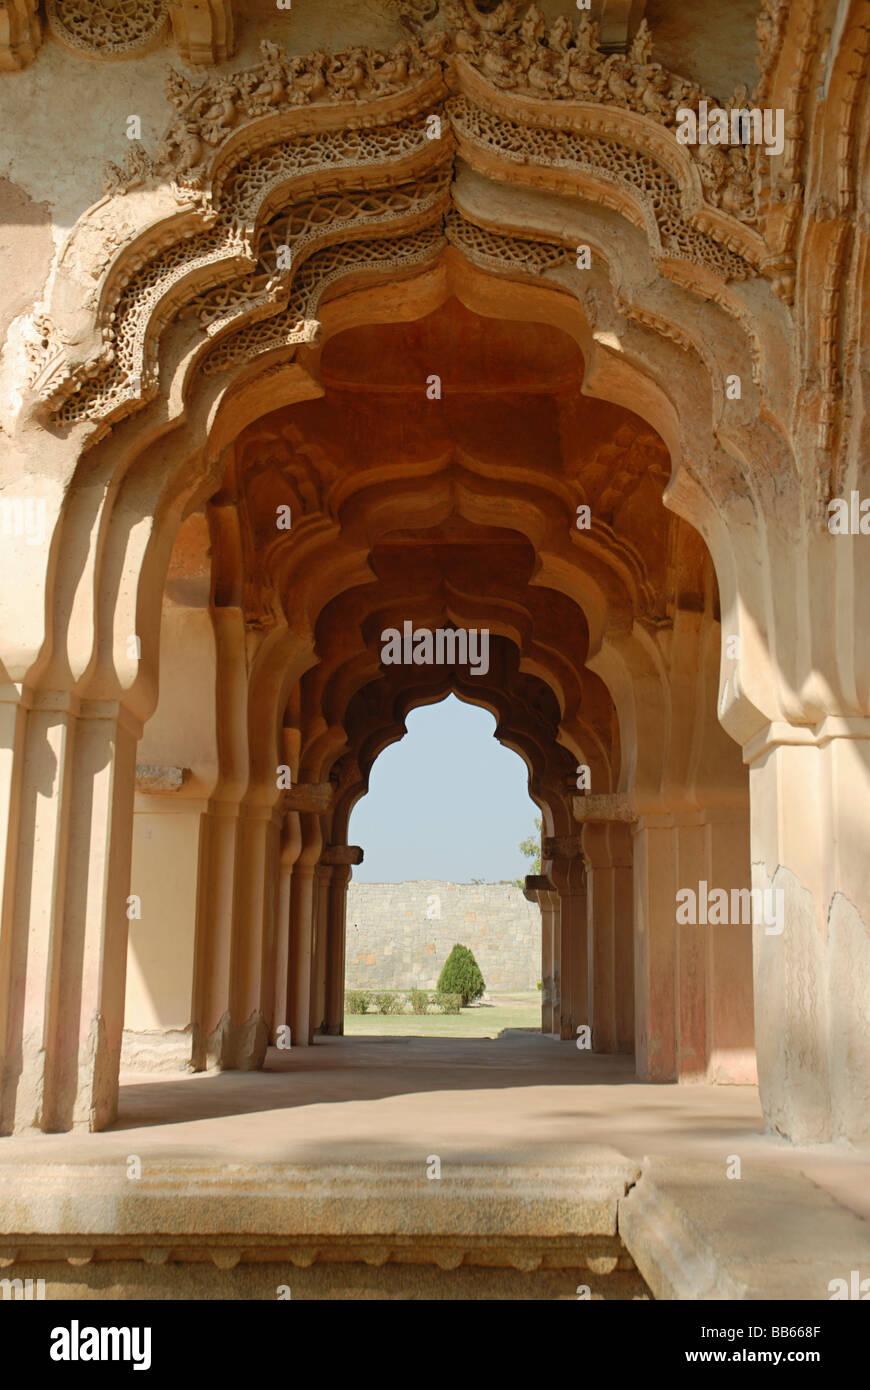 Hampi - Karnataka - Lotus Mahal View of the recessed & foliated arches. - Stock Image